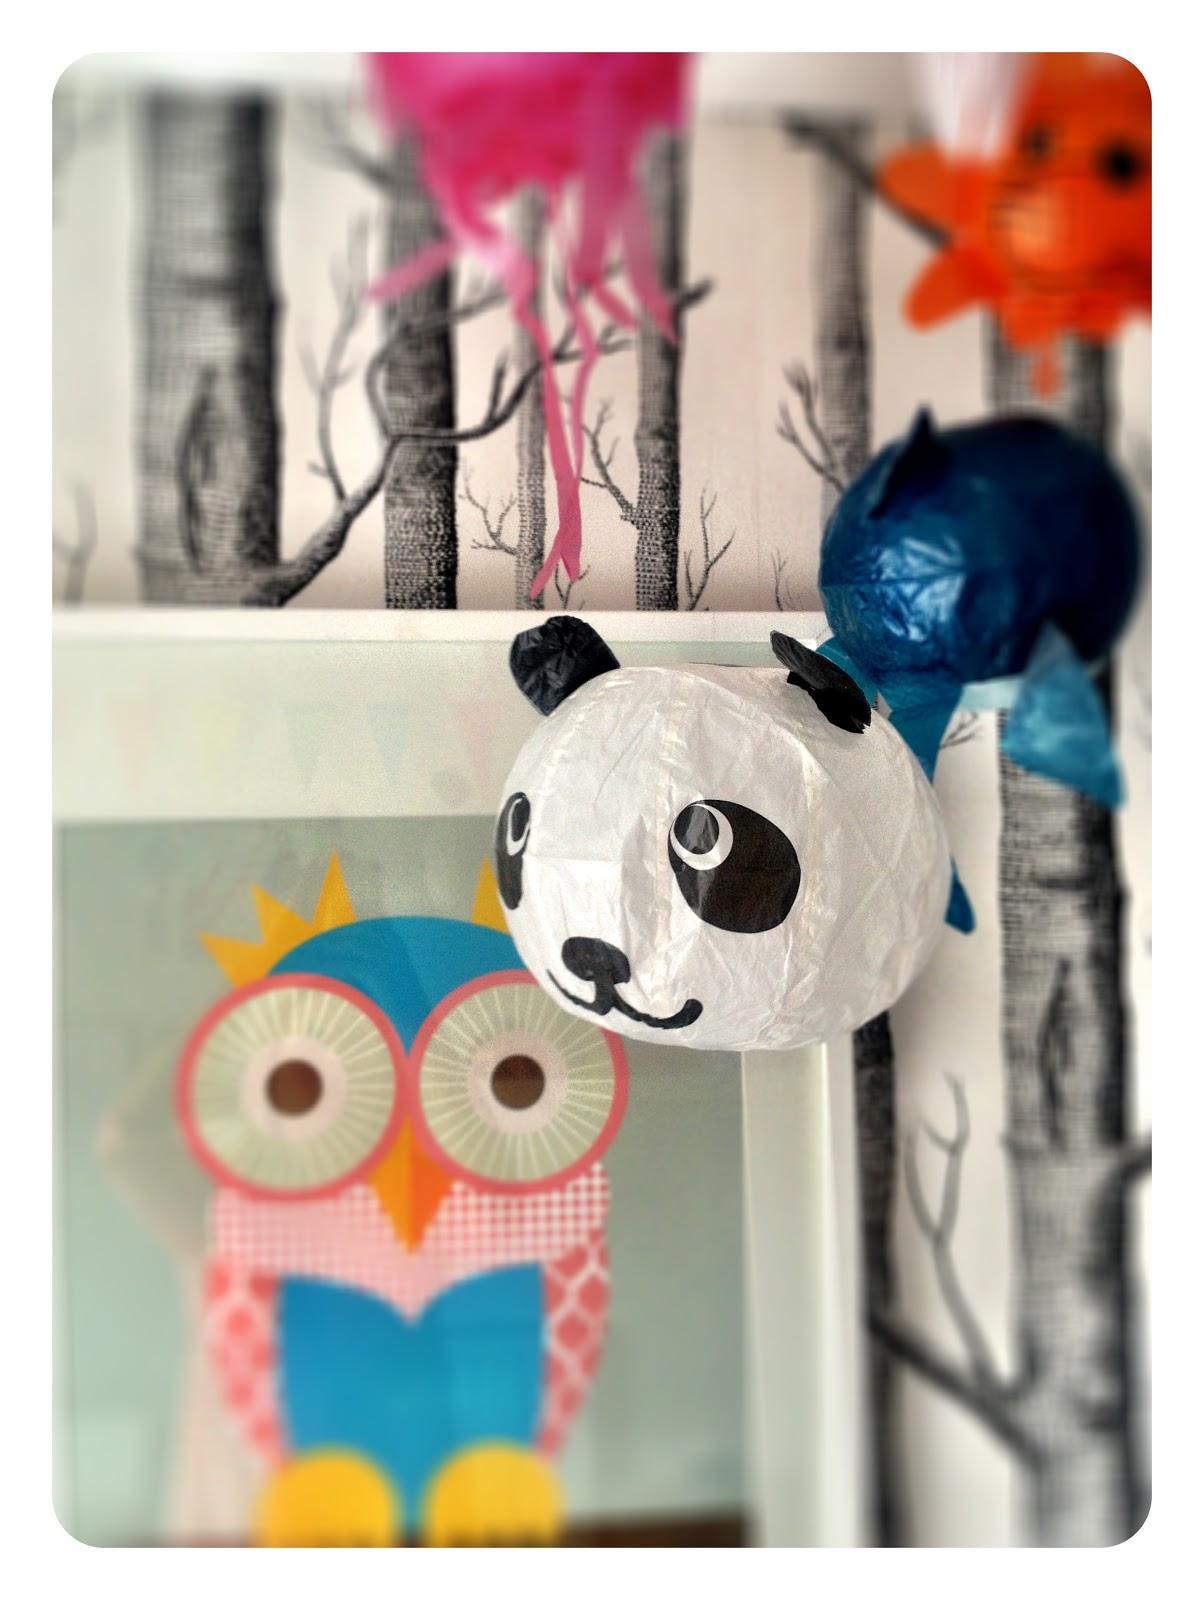 http://1.bp.blogspot.com/-SwzH9lt36_Q/UU905ShrKaI/AAAAAAAAA2c/kyk2NWq3OYo/s1600/owl+and+tissue+balls+.JPG